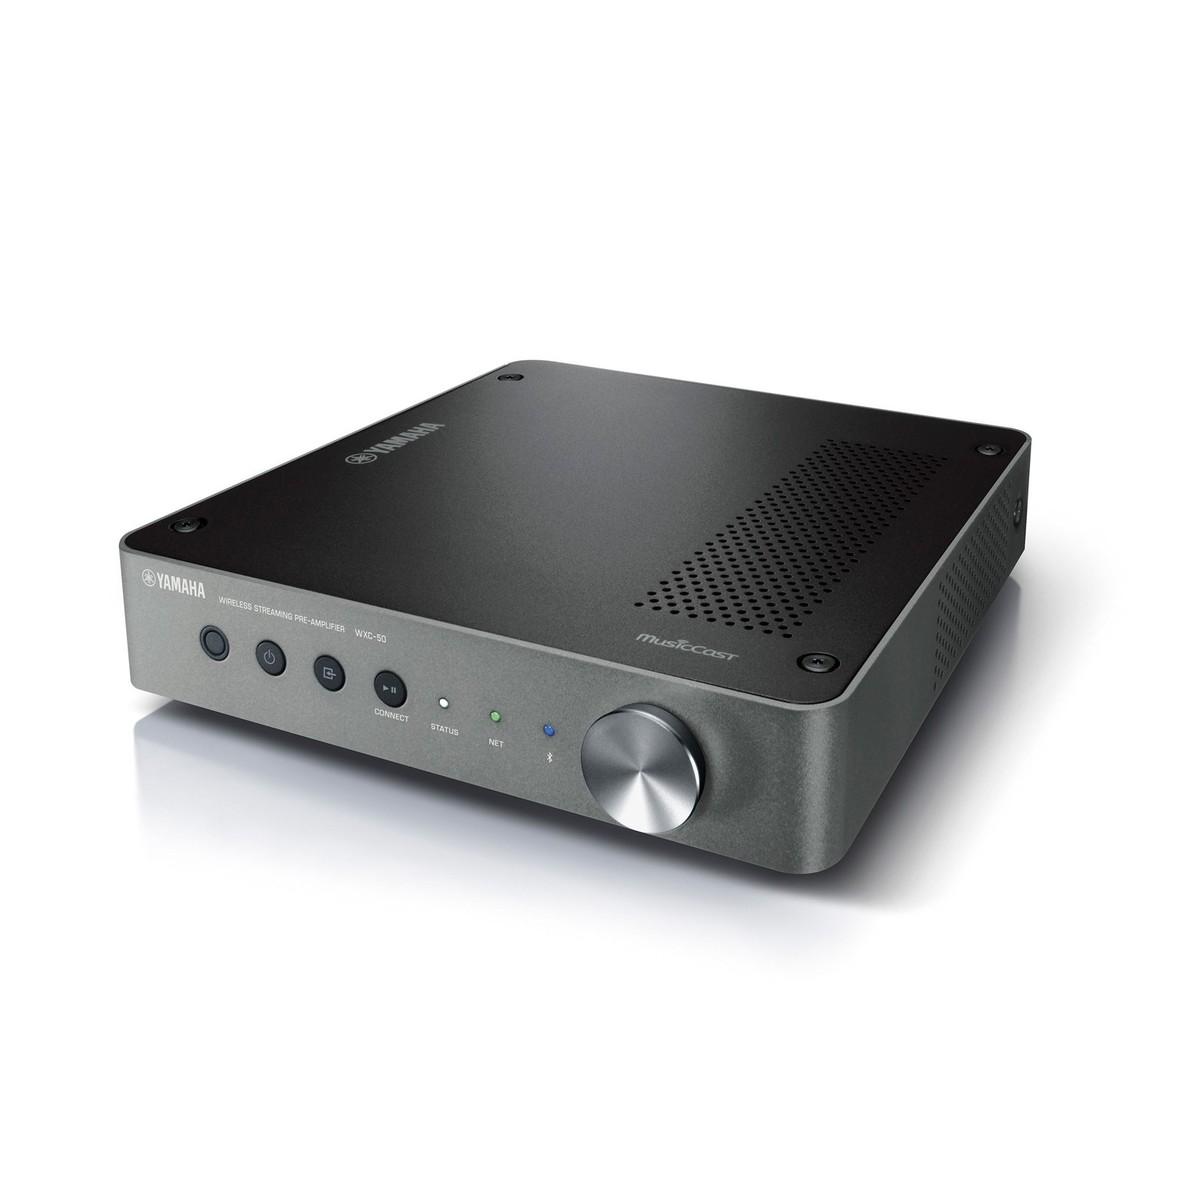 Yamaha WXC-50 Wireless Streaming Pre-Amplifier bei Gear4music